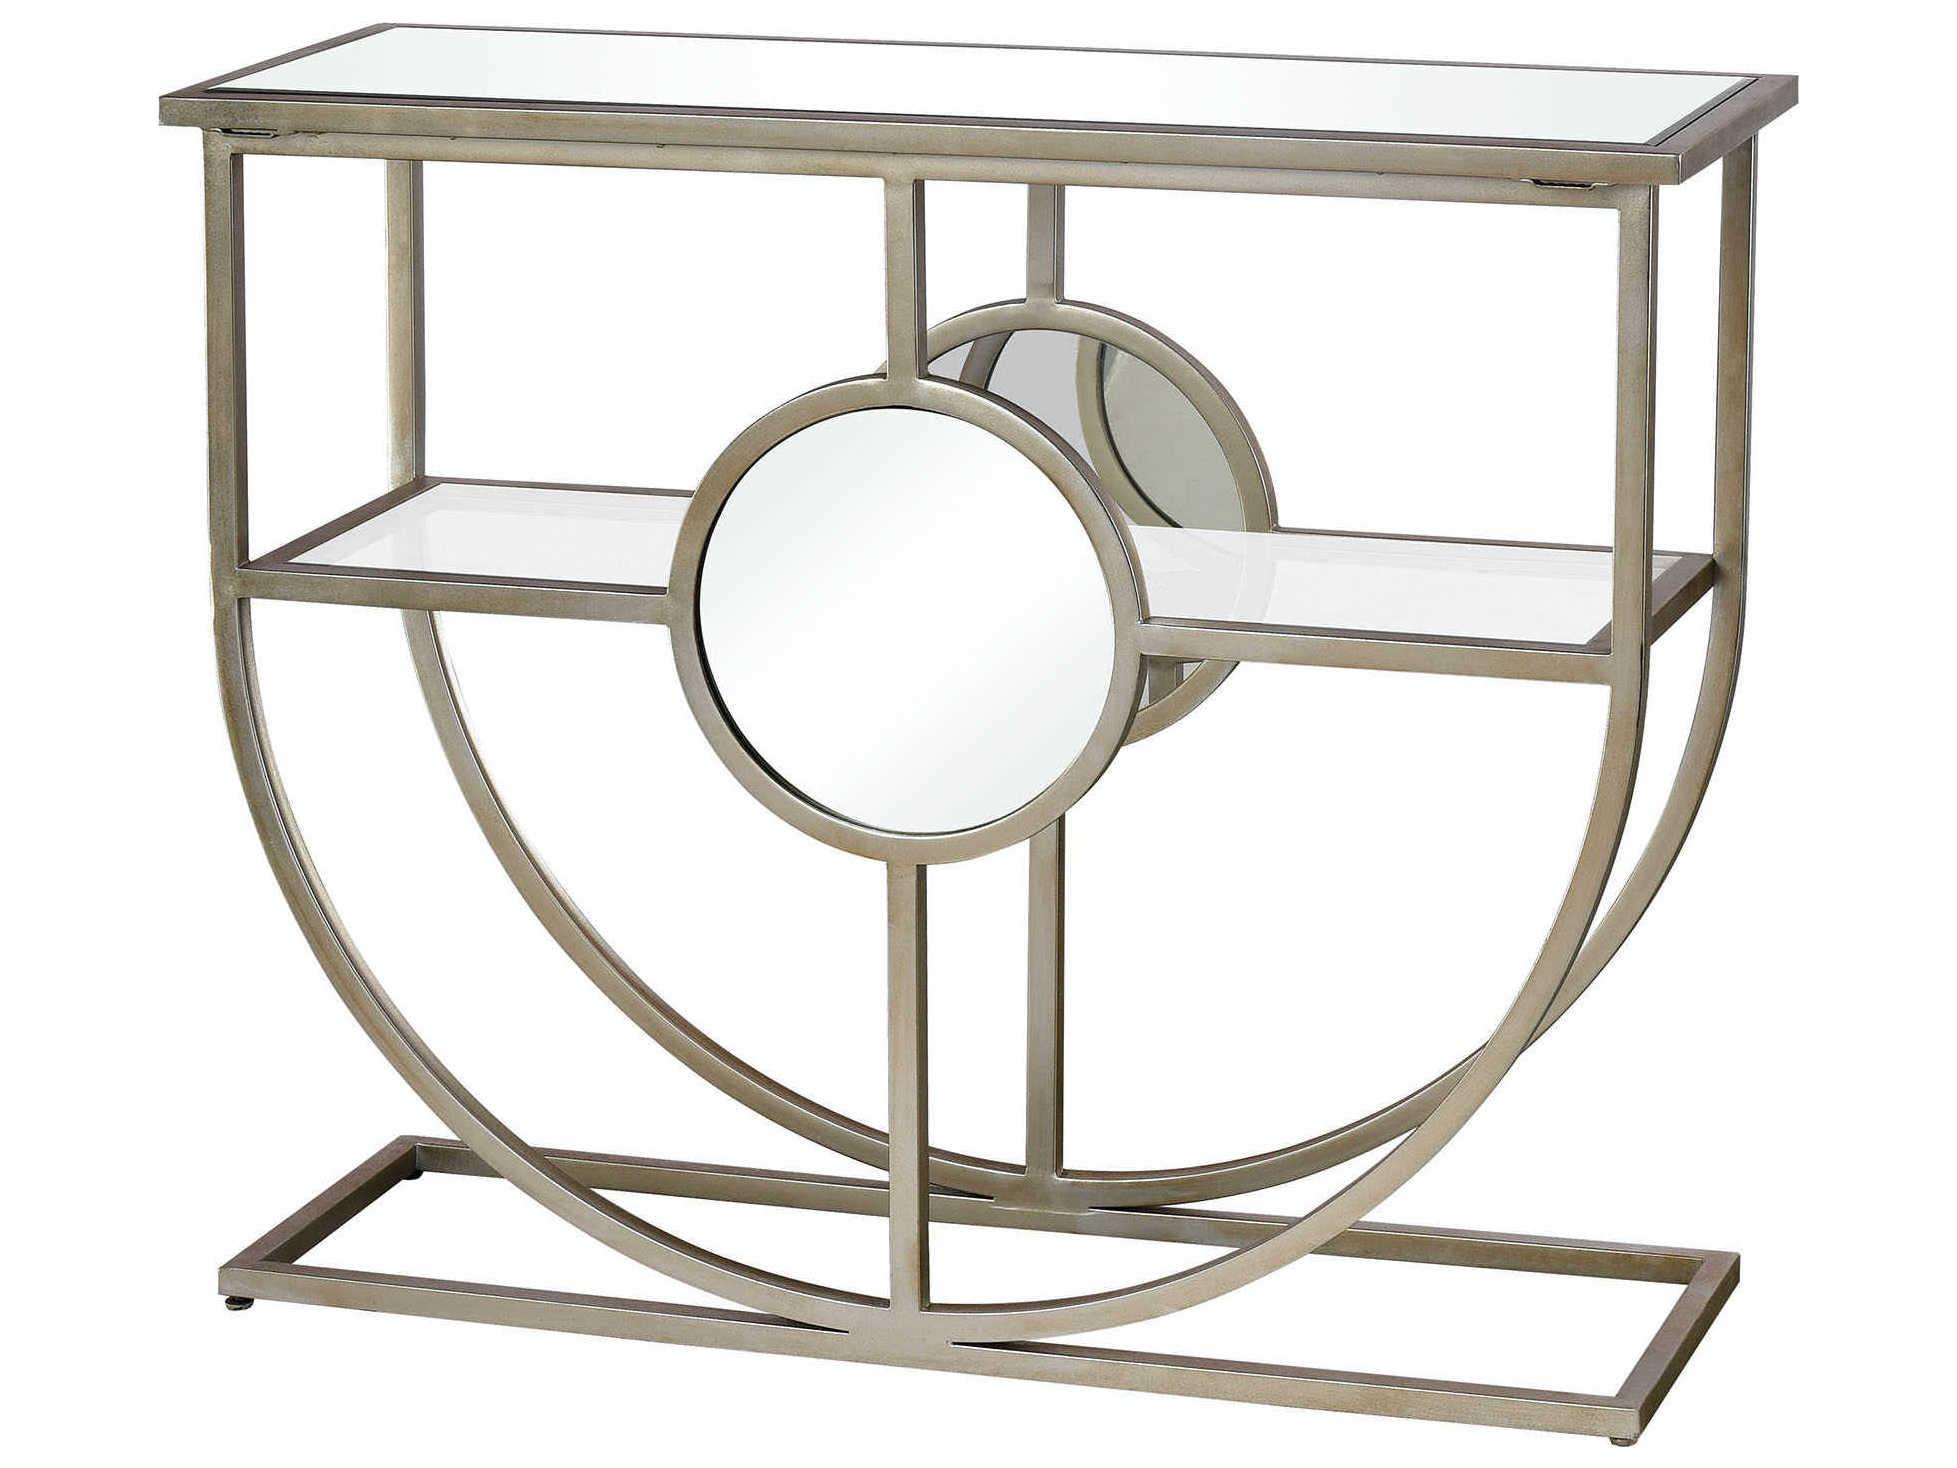 Sensational Elk Lighting Polaris Antique Silver Clear Mirror 38 Wide Rectangular Console Table Machost Co Dining Chair Design Ideas Machostcouk